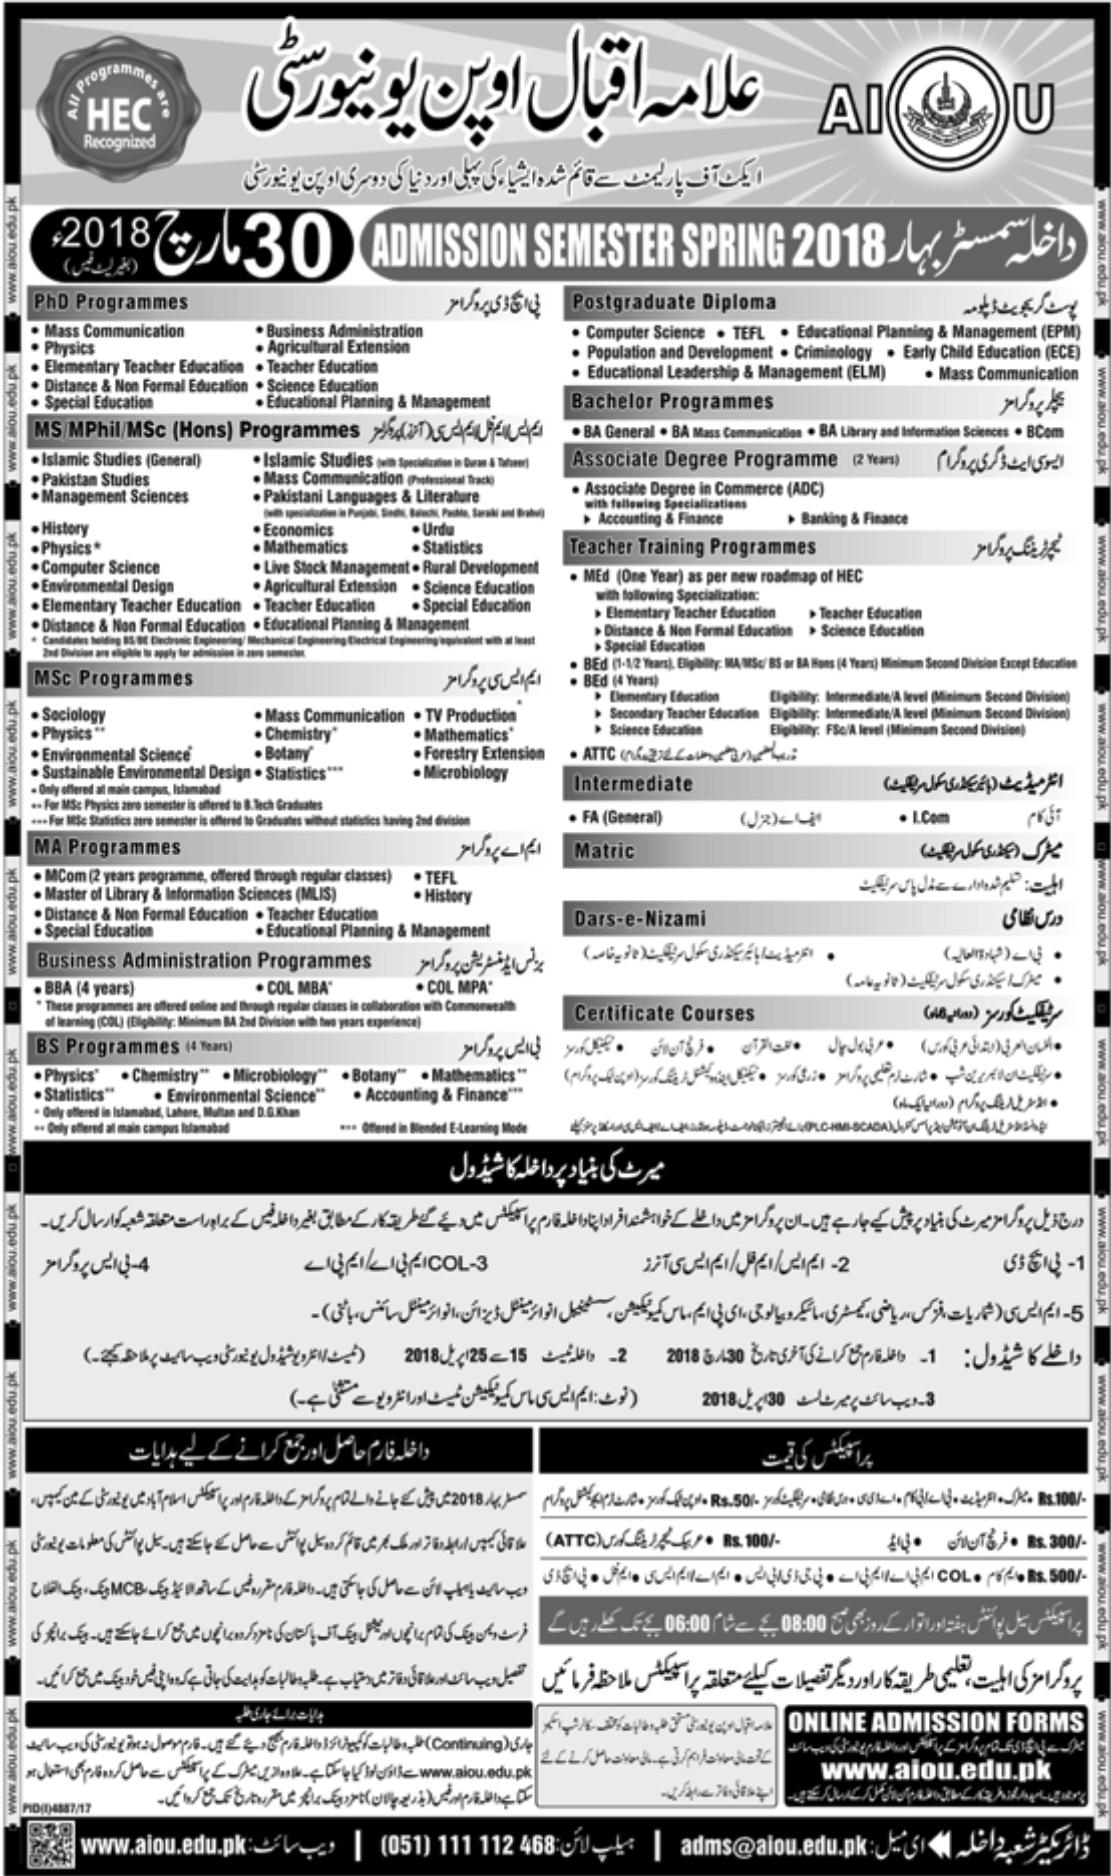 Allama Iqbal Open University Islamabad AIOU Spring Admission 2018